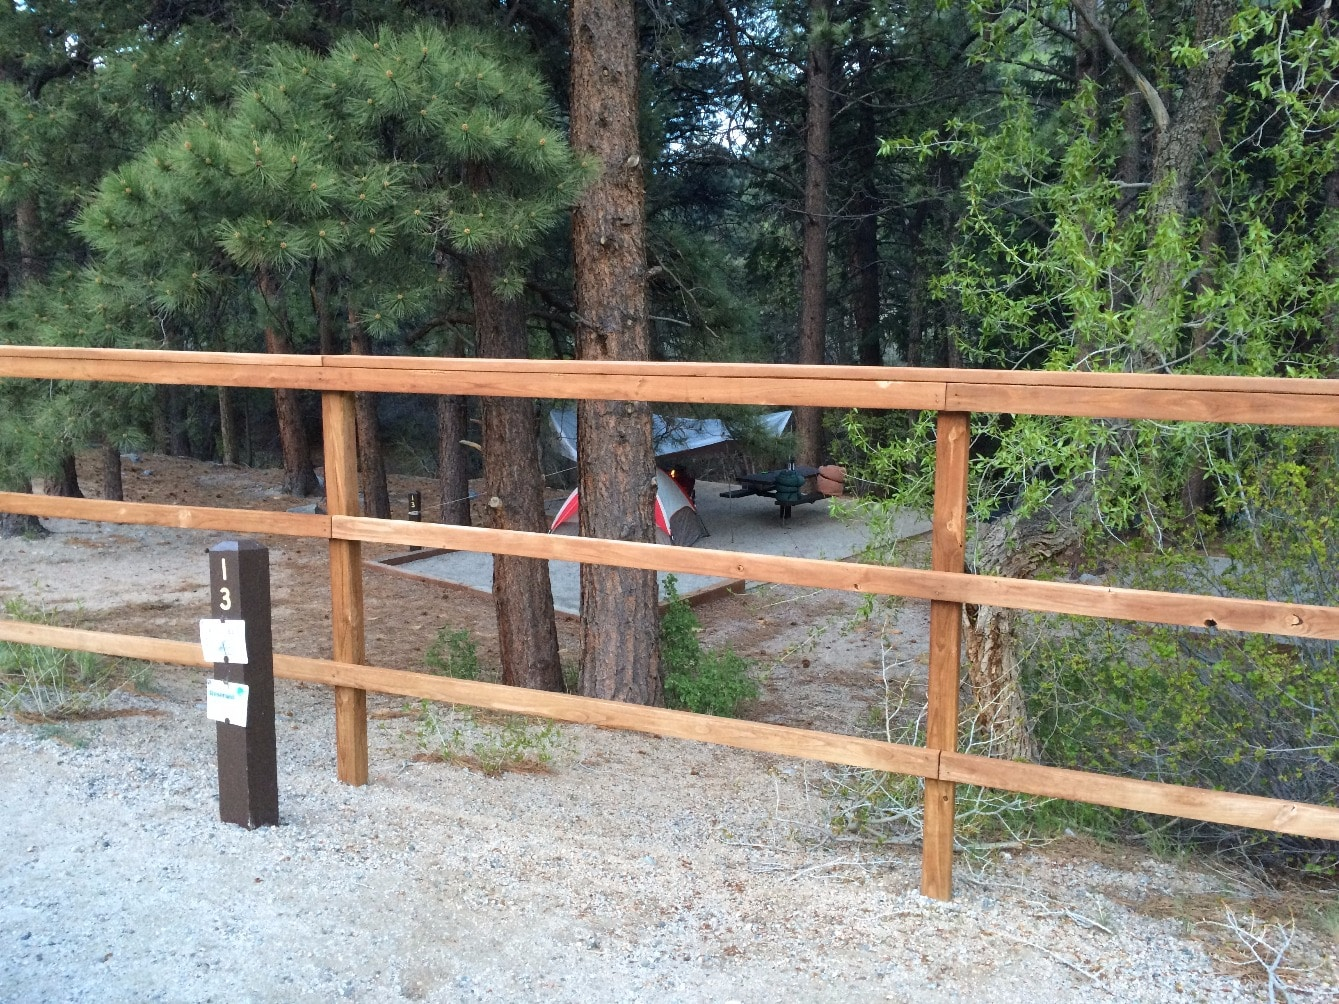 Campsite #13 - Chalk Lake campground